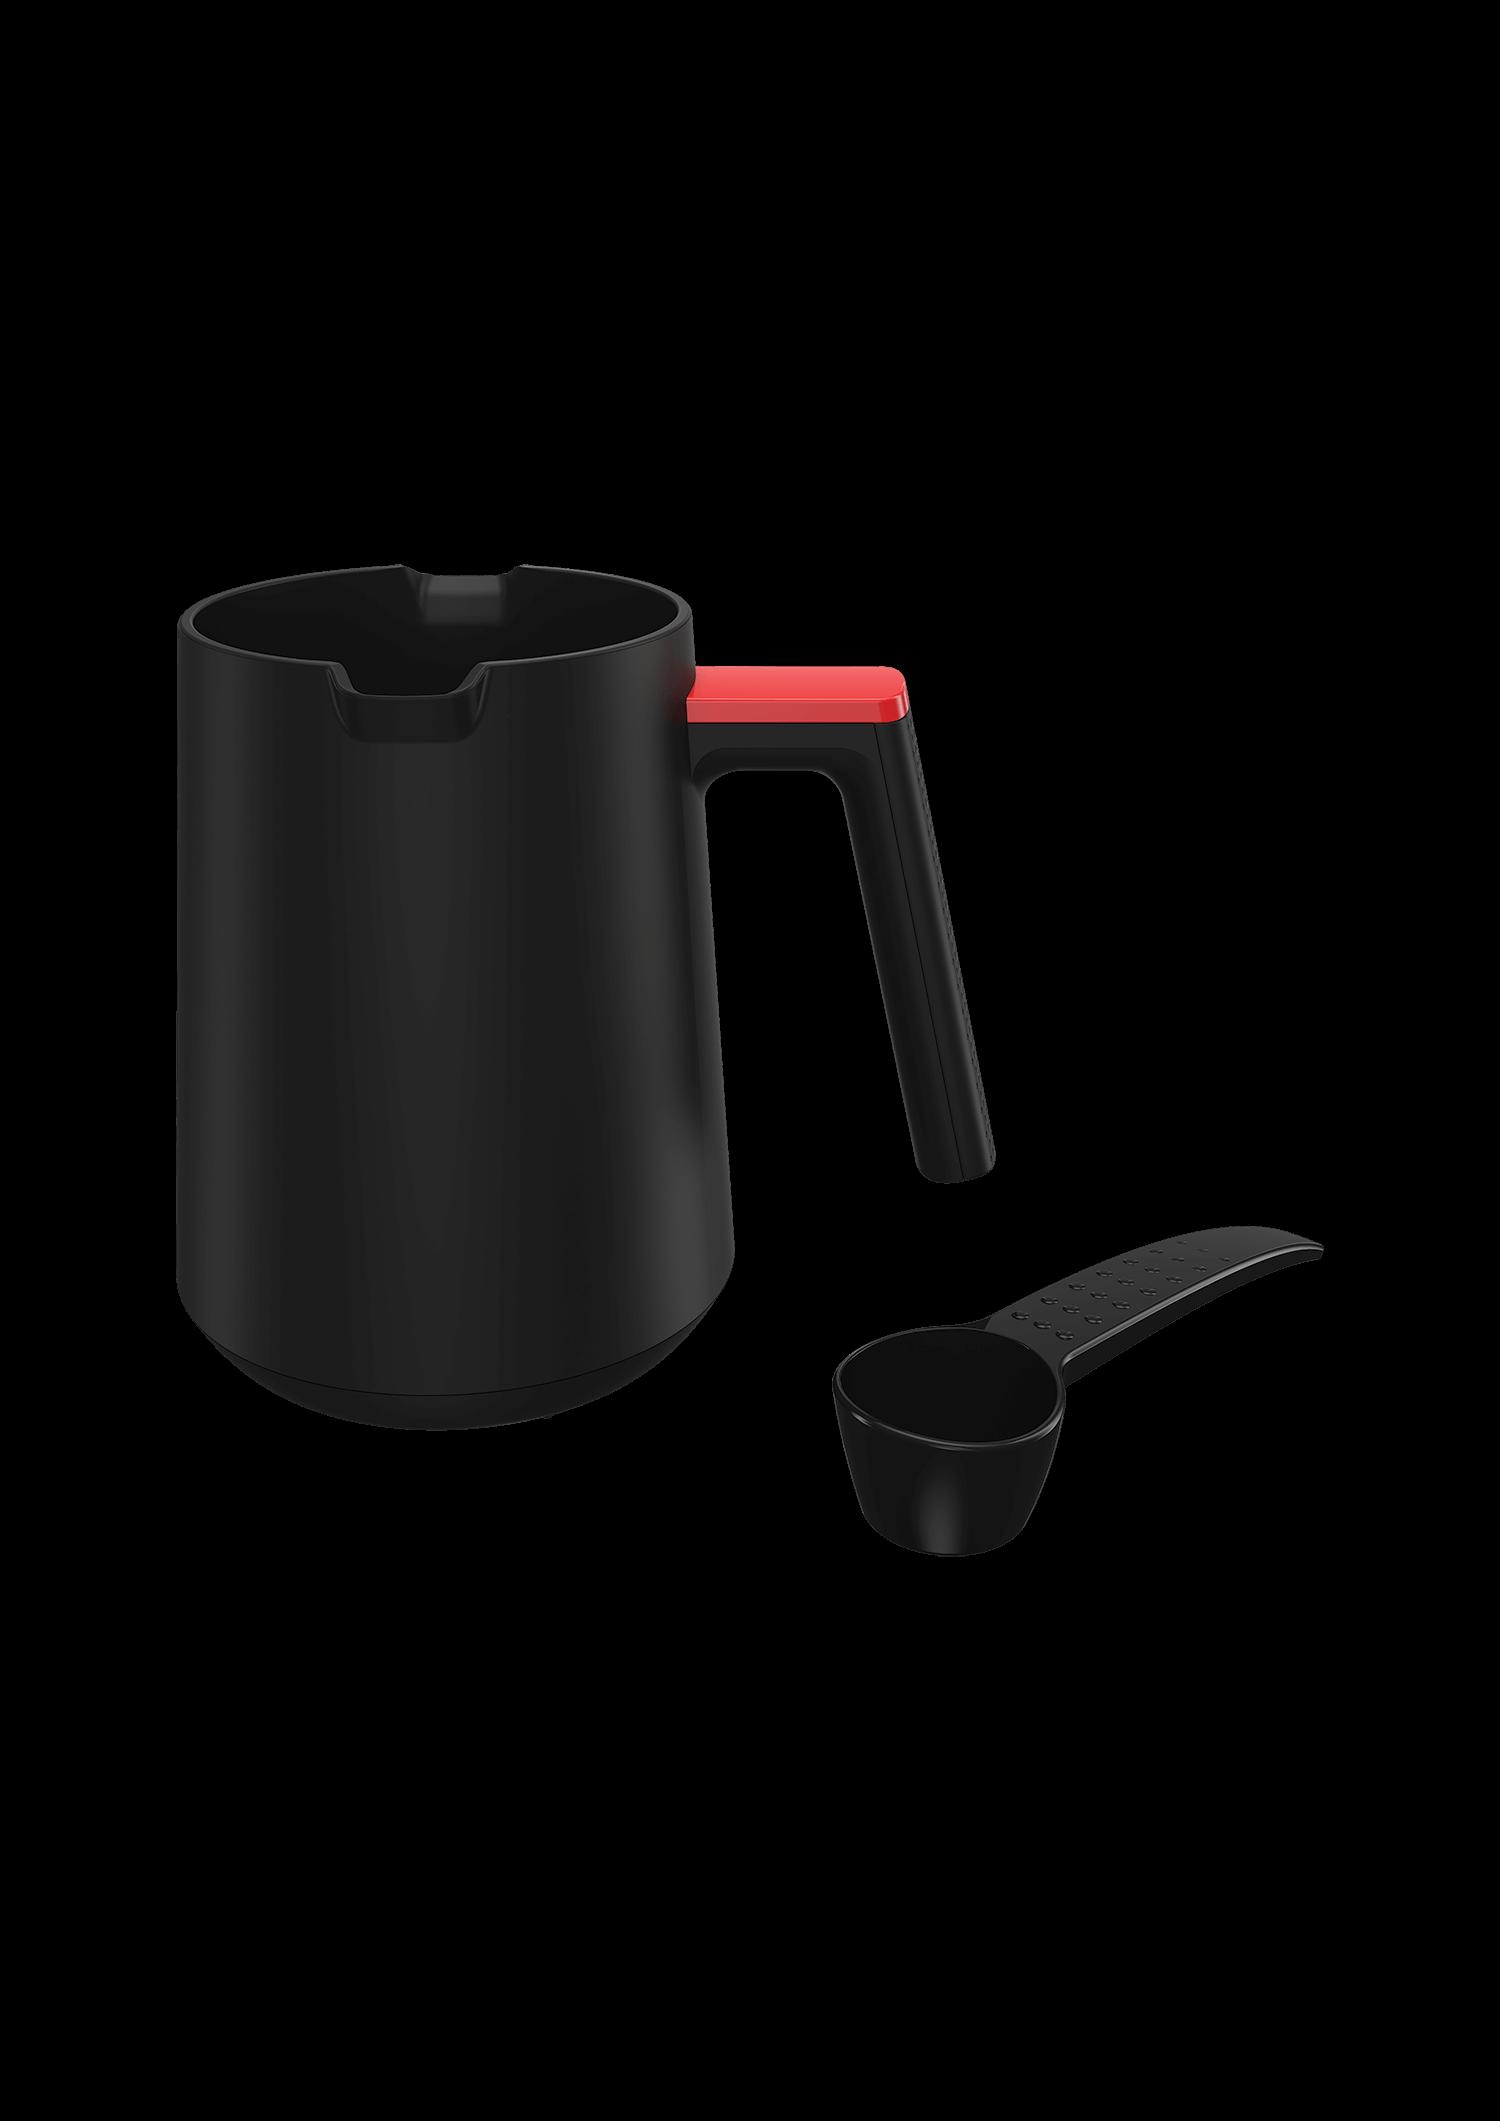 BEKO Turkish Coffee Machine 4 Cups TKM2940K